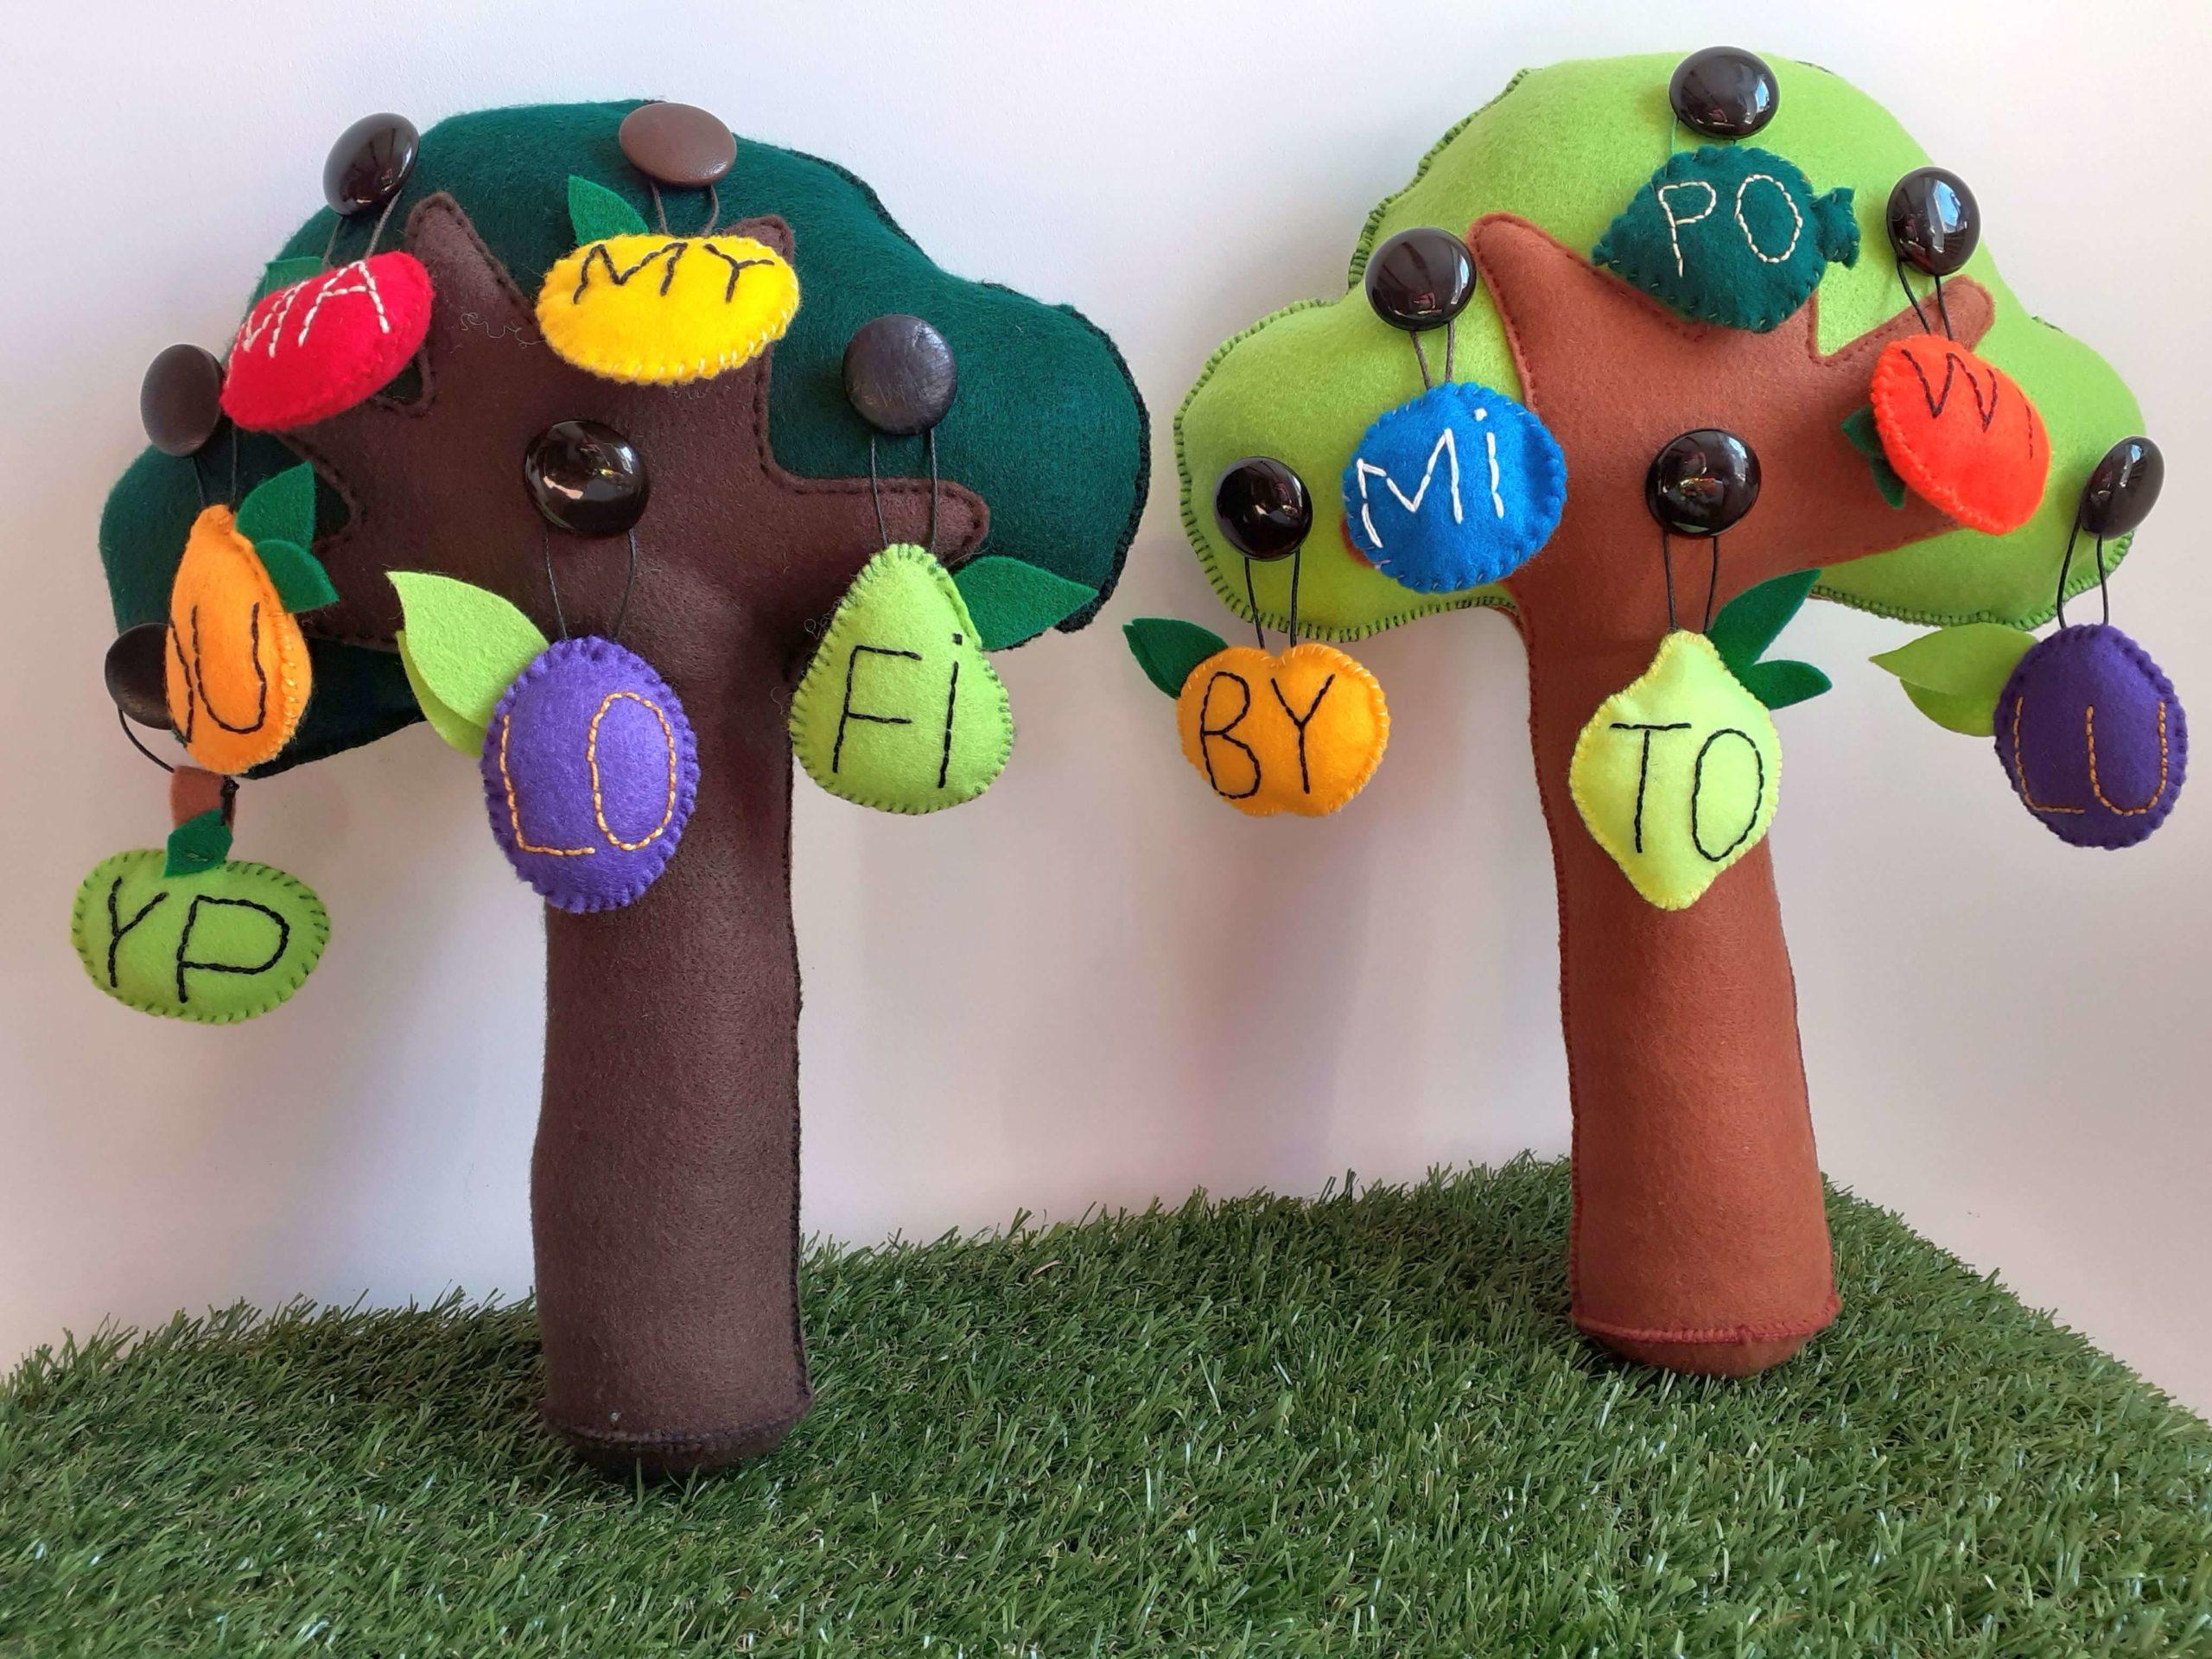 sylabowe drzewa z sylabowymi owocami